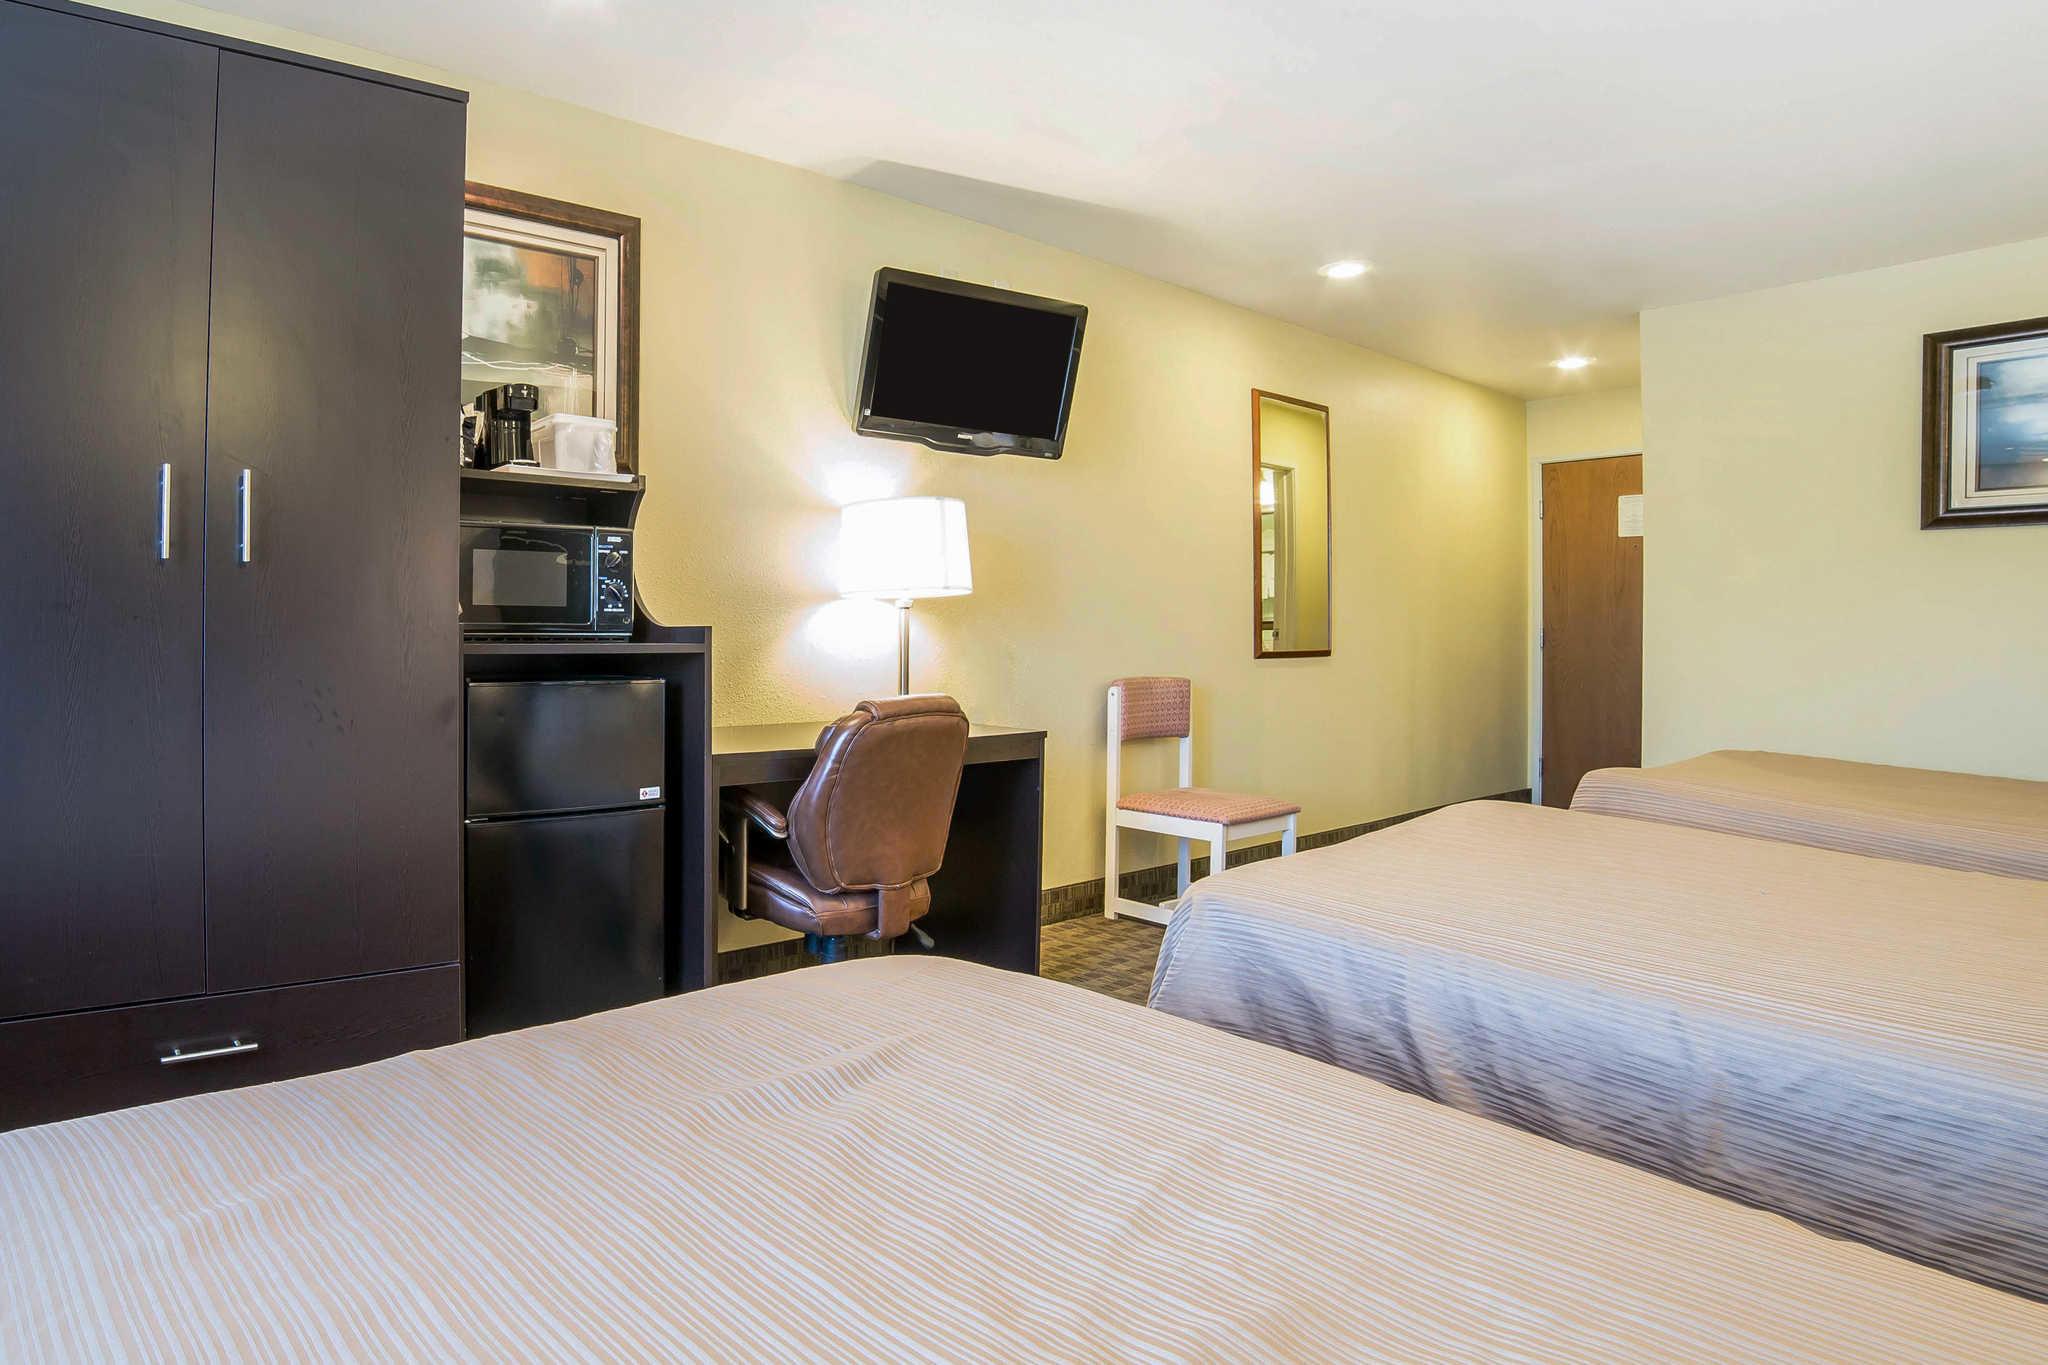 Quality Inn & Suites Elko image 24